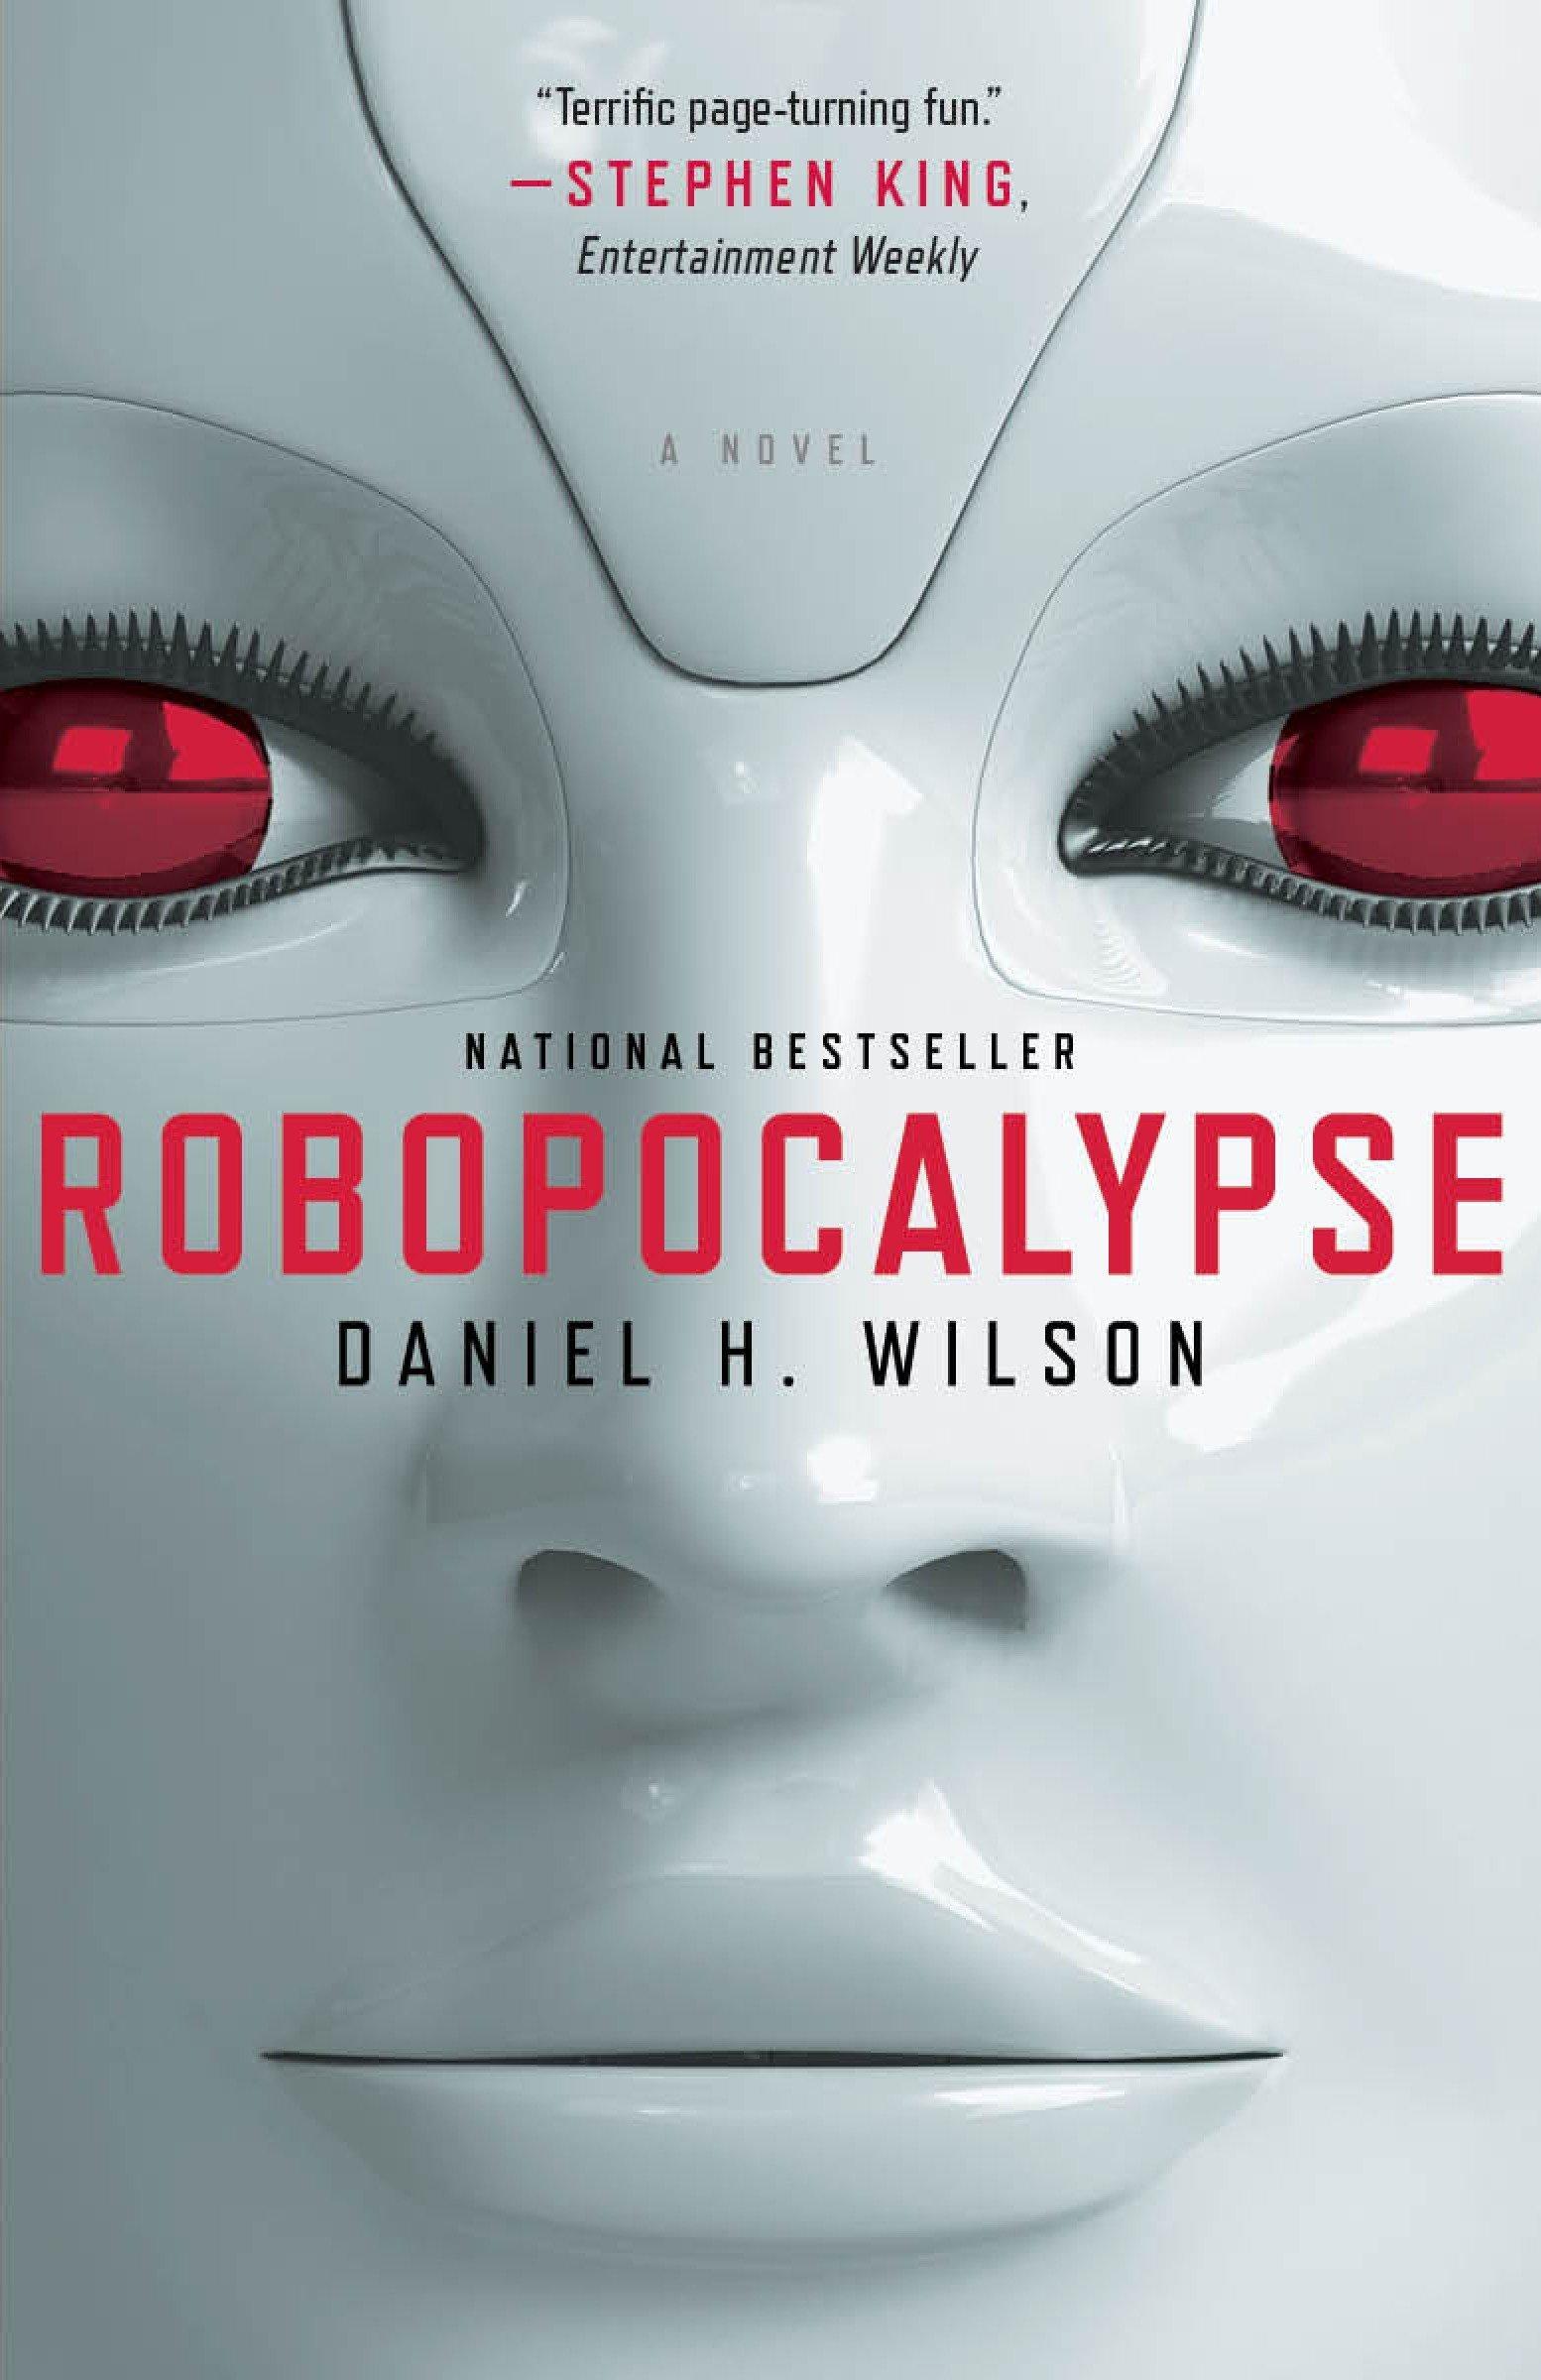 Robopocalypse: A Novel (Vintage Contemporaries): Wilson, Daniel H.:  9780307740809: Amazon.com: Books